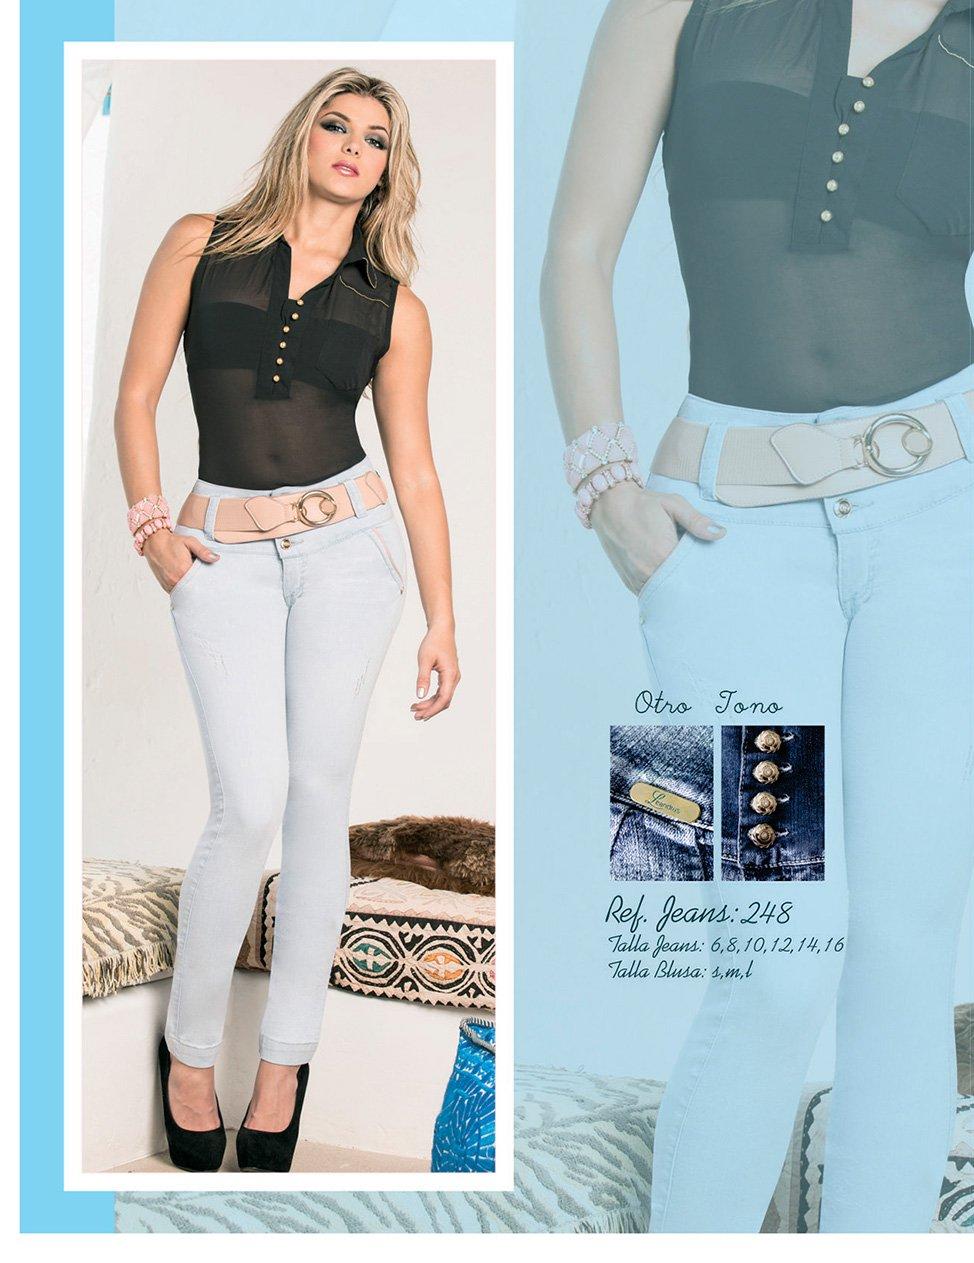 Amazon.com : Jeans Colombianos Levanta Cola Leandrus 248 Dark Blue - Us Size 7-8 : Everything Else